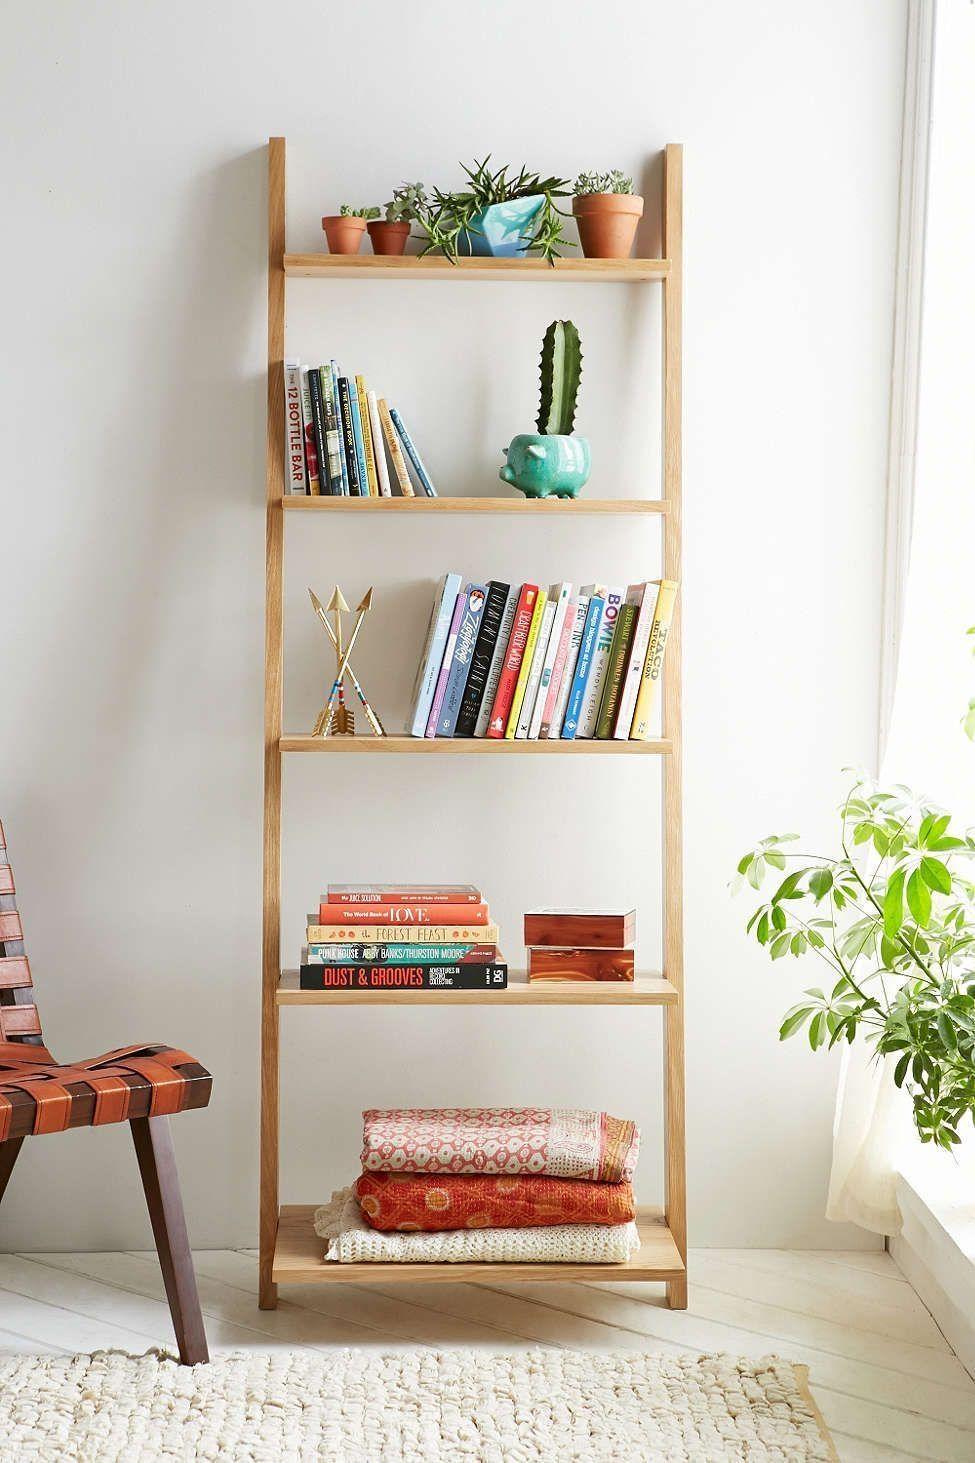 36 Simple Bookshelf Ideas For Your Modern Home Decor Decoarchi Com Cool Bookshelves Bookshelf Design Simple Bookshelf